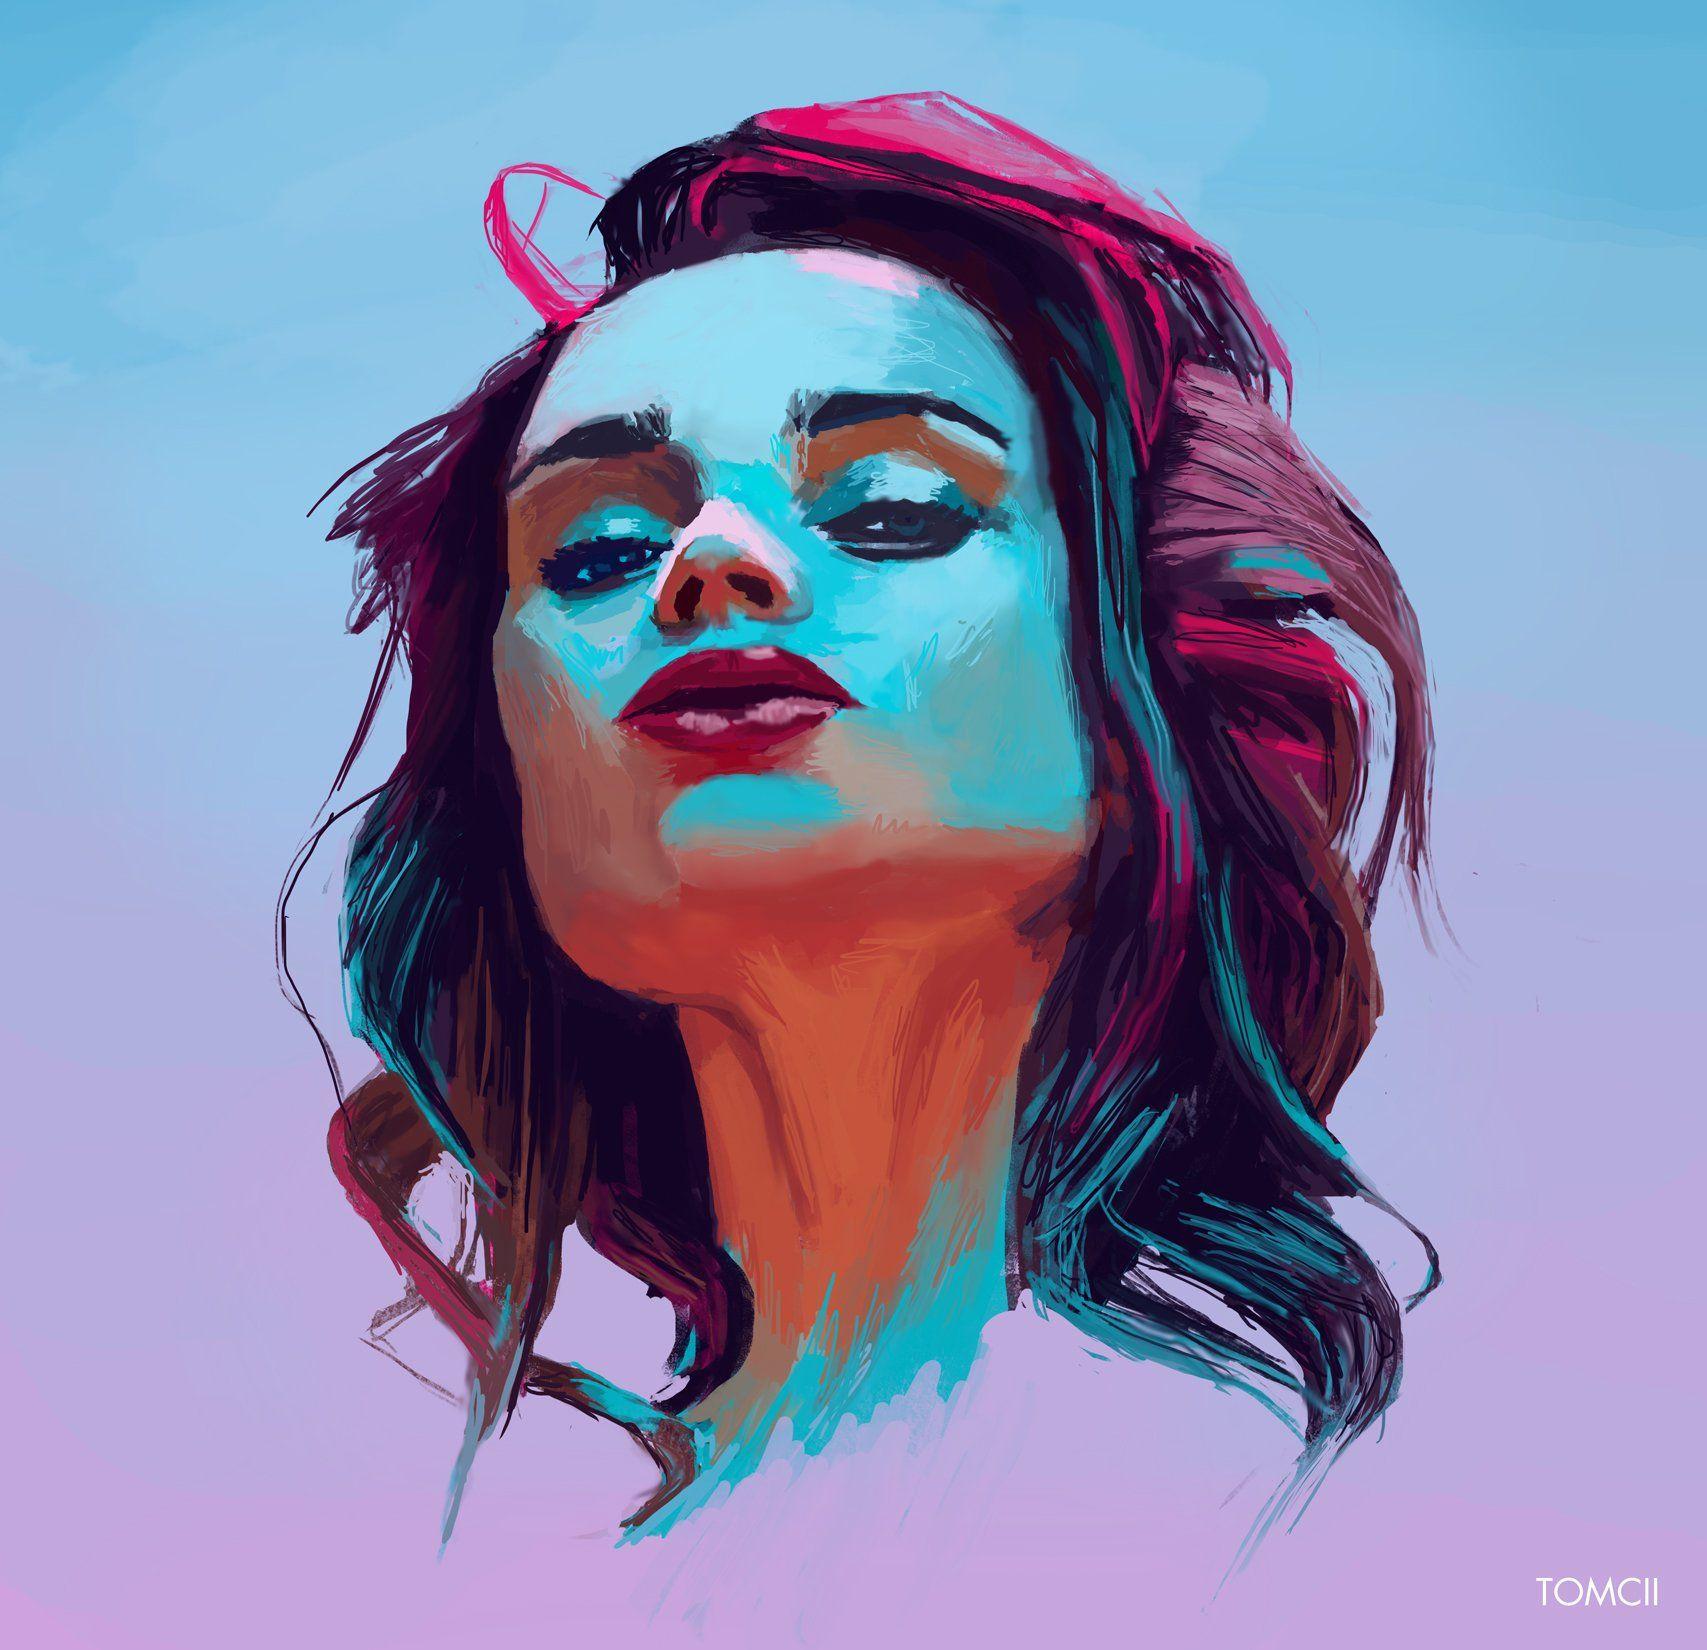 Tomcii In 2019 Art & Illustration Inspiration Painting